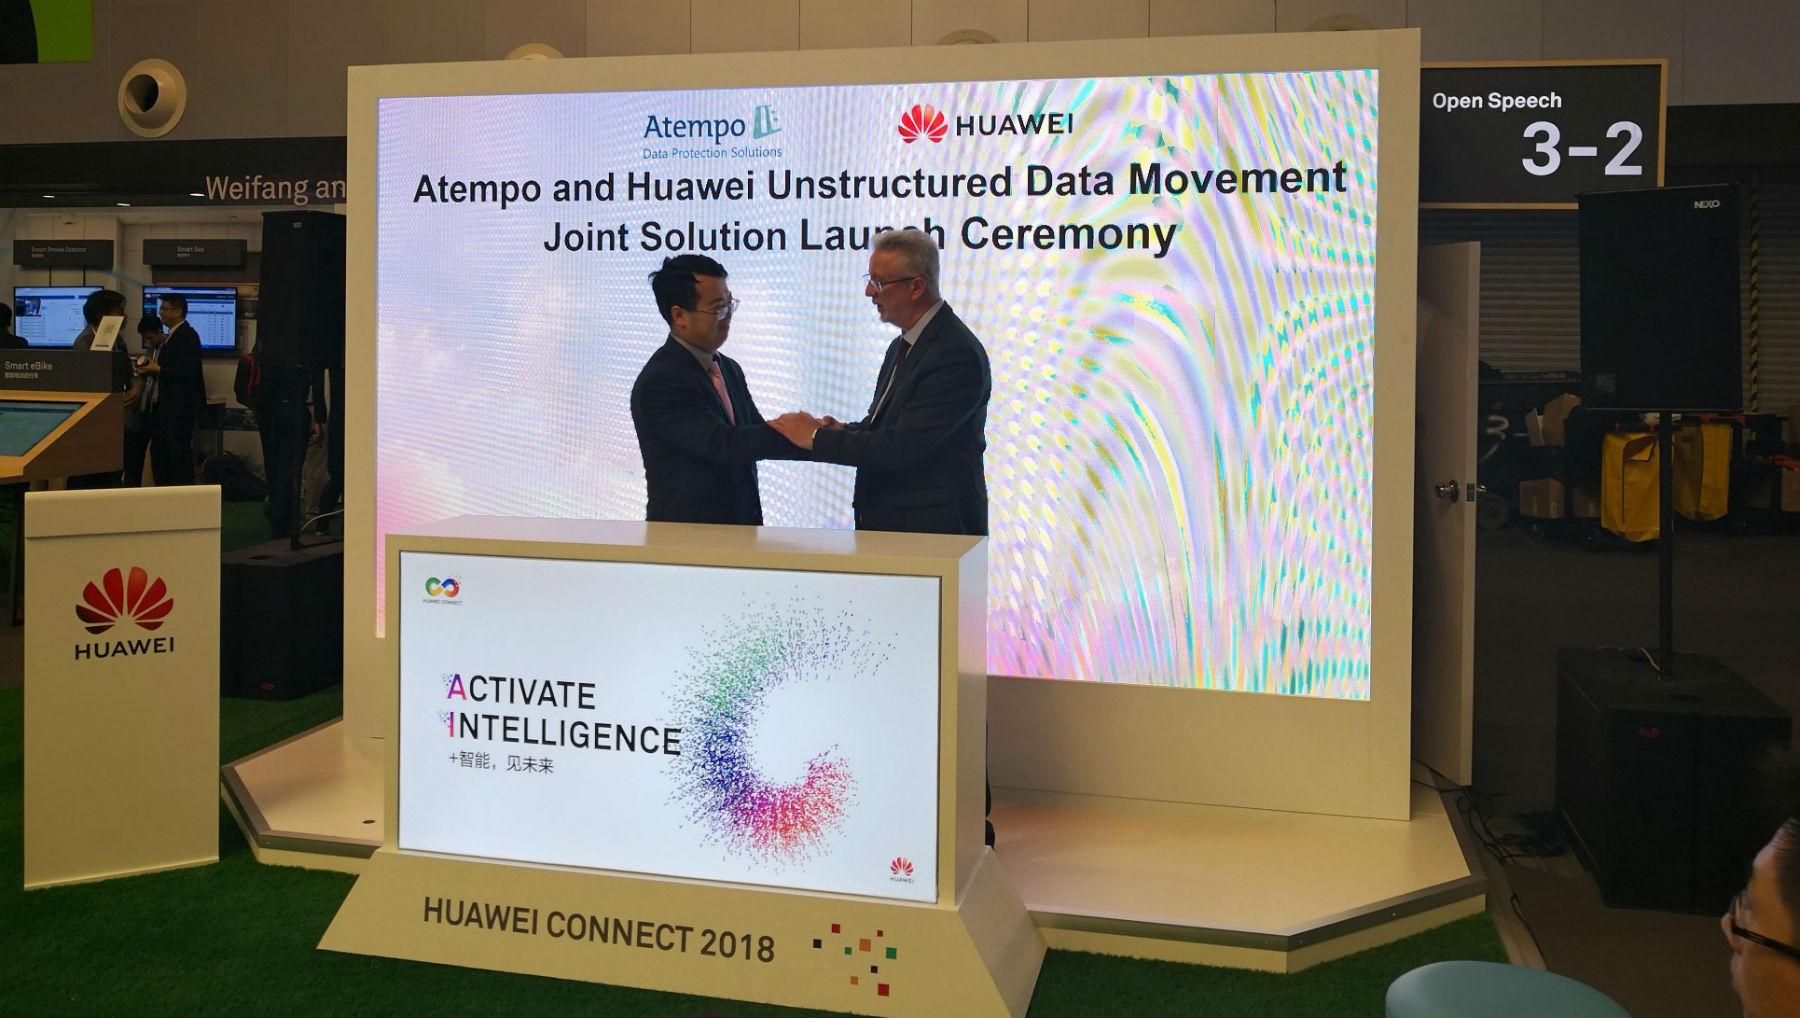 huawei-atempo-alliance